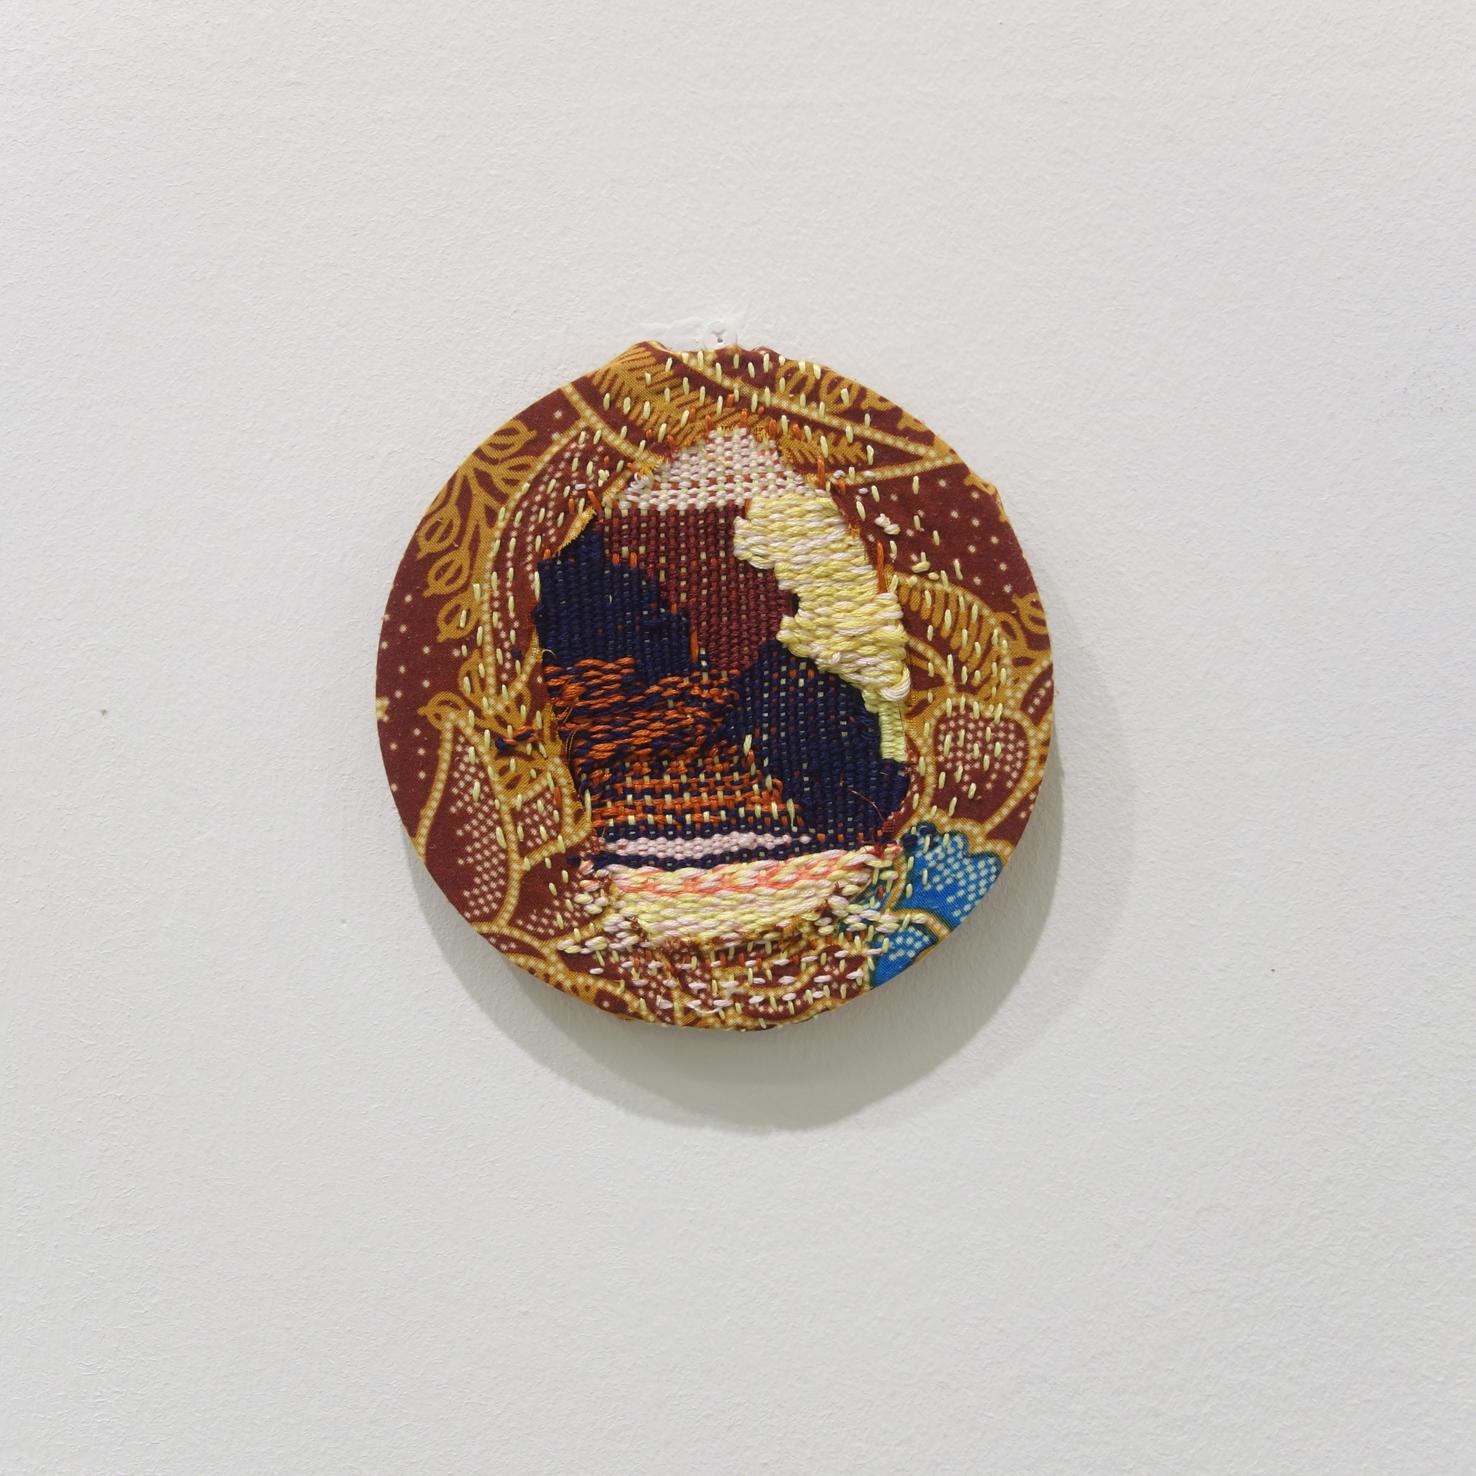 Izziyana Suhaimi  Cross Section of Bone V  2015 Woven cotton thread darned on found Batik; wooden hoop Ø13 cm